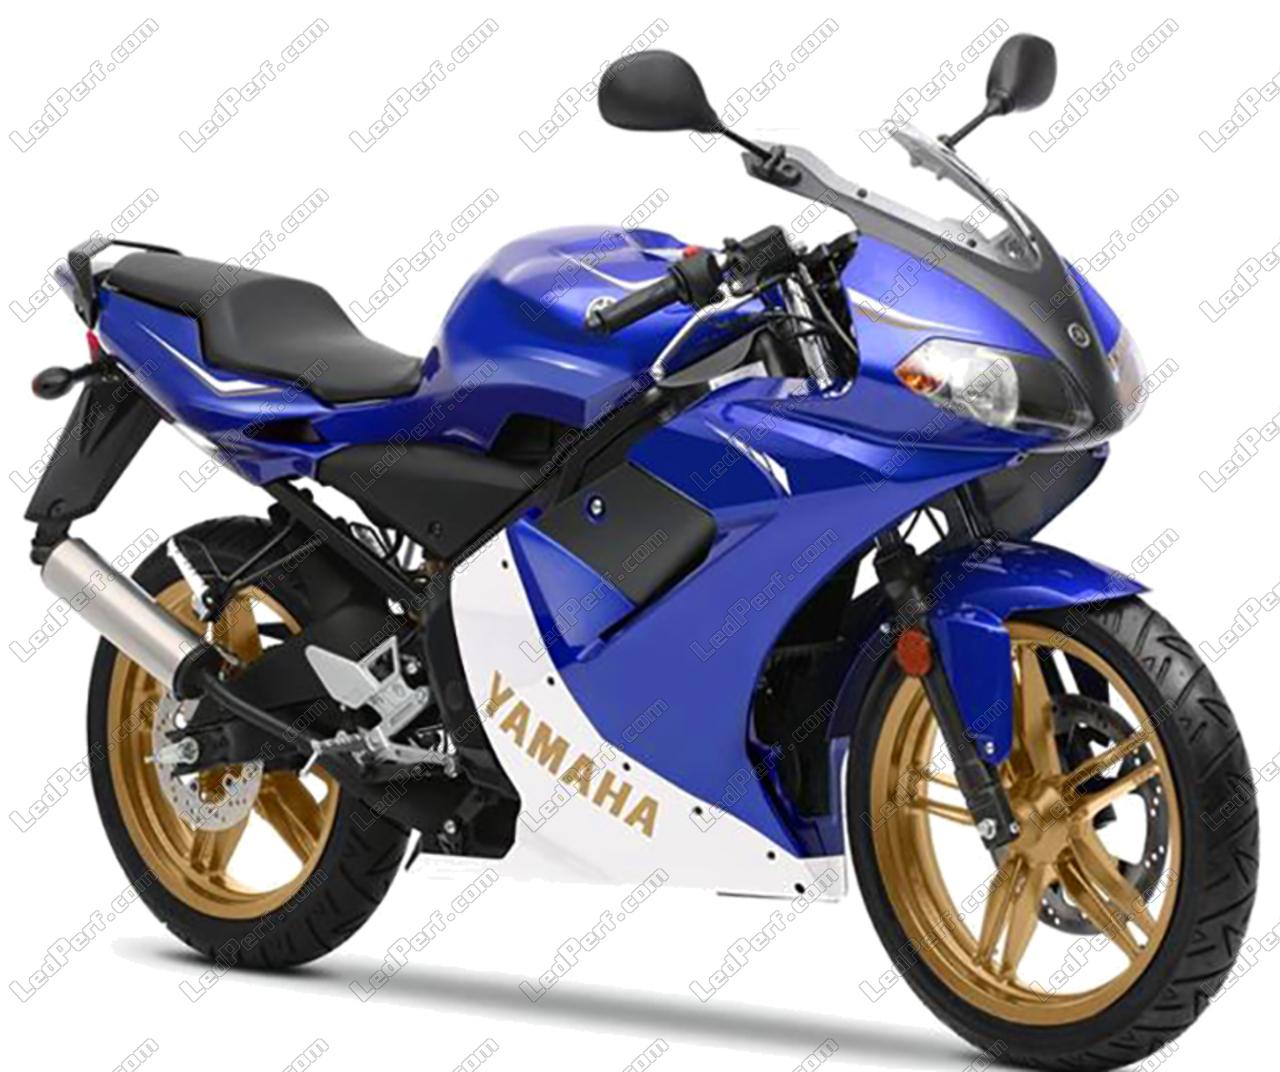 Yamaha Tzr 50 Blue Wallpaper : Hd Wallpapers